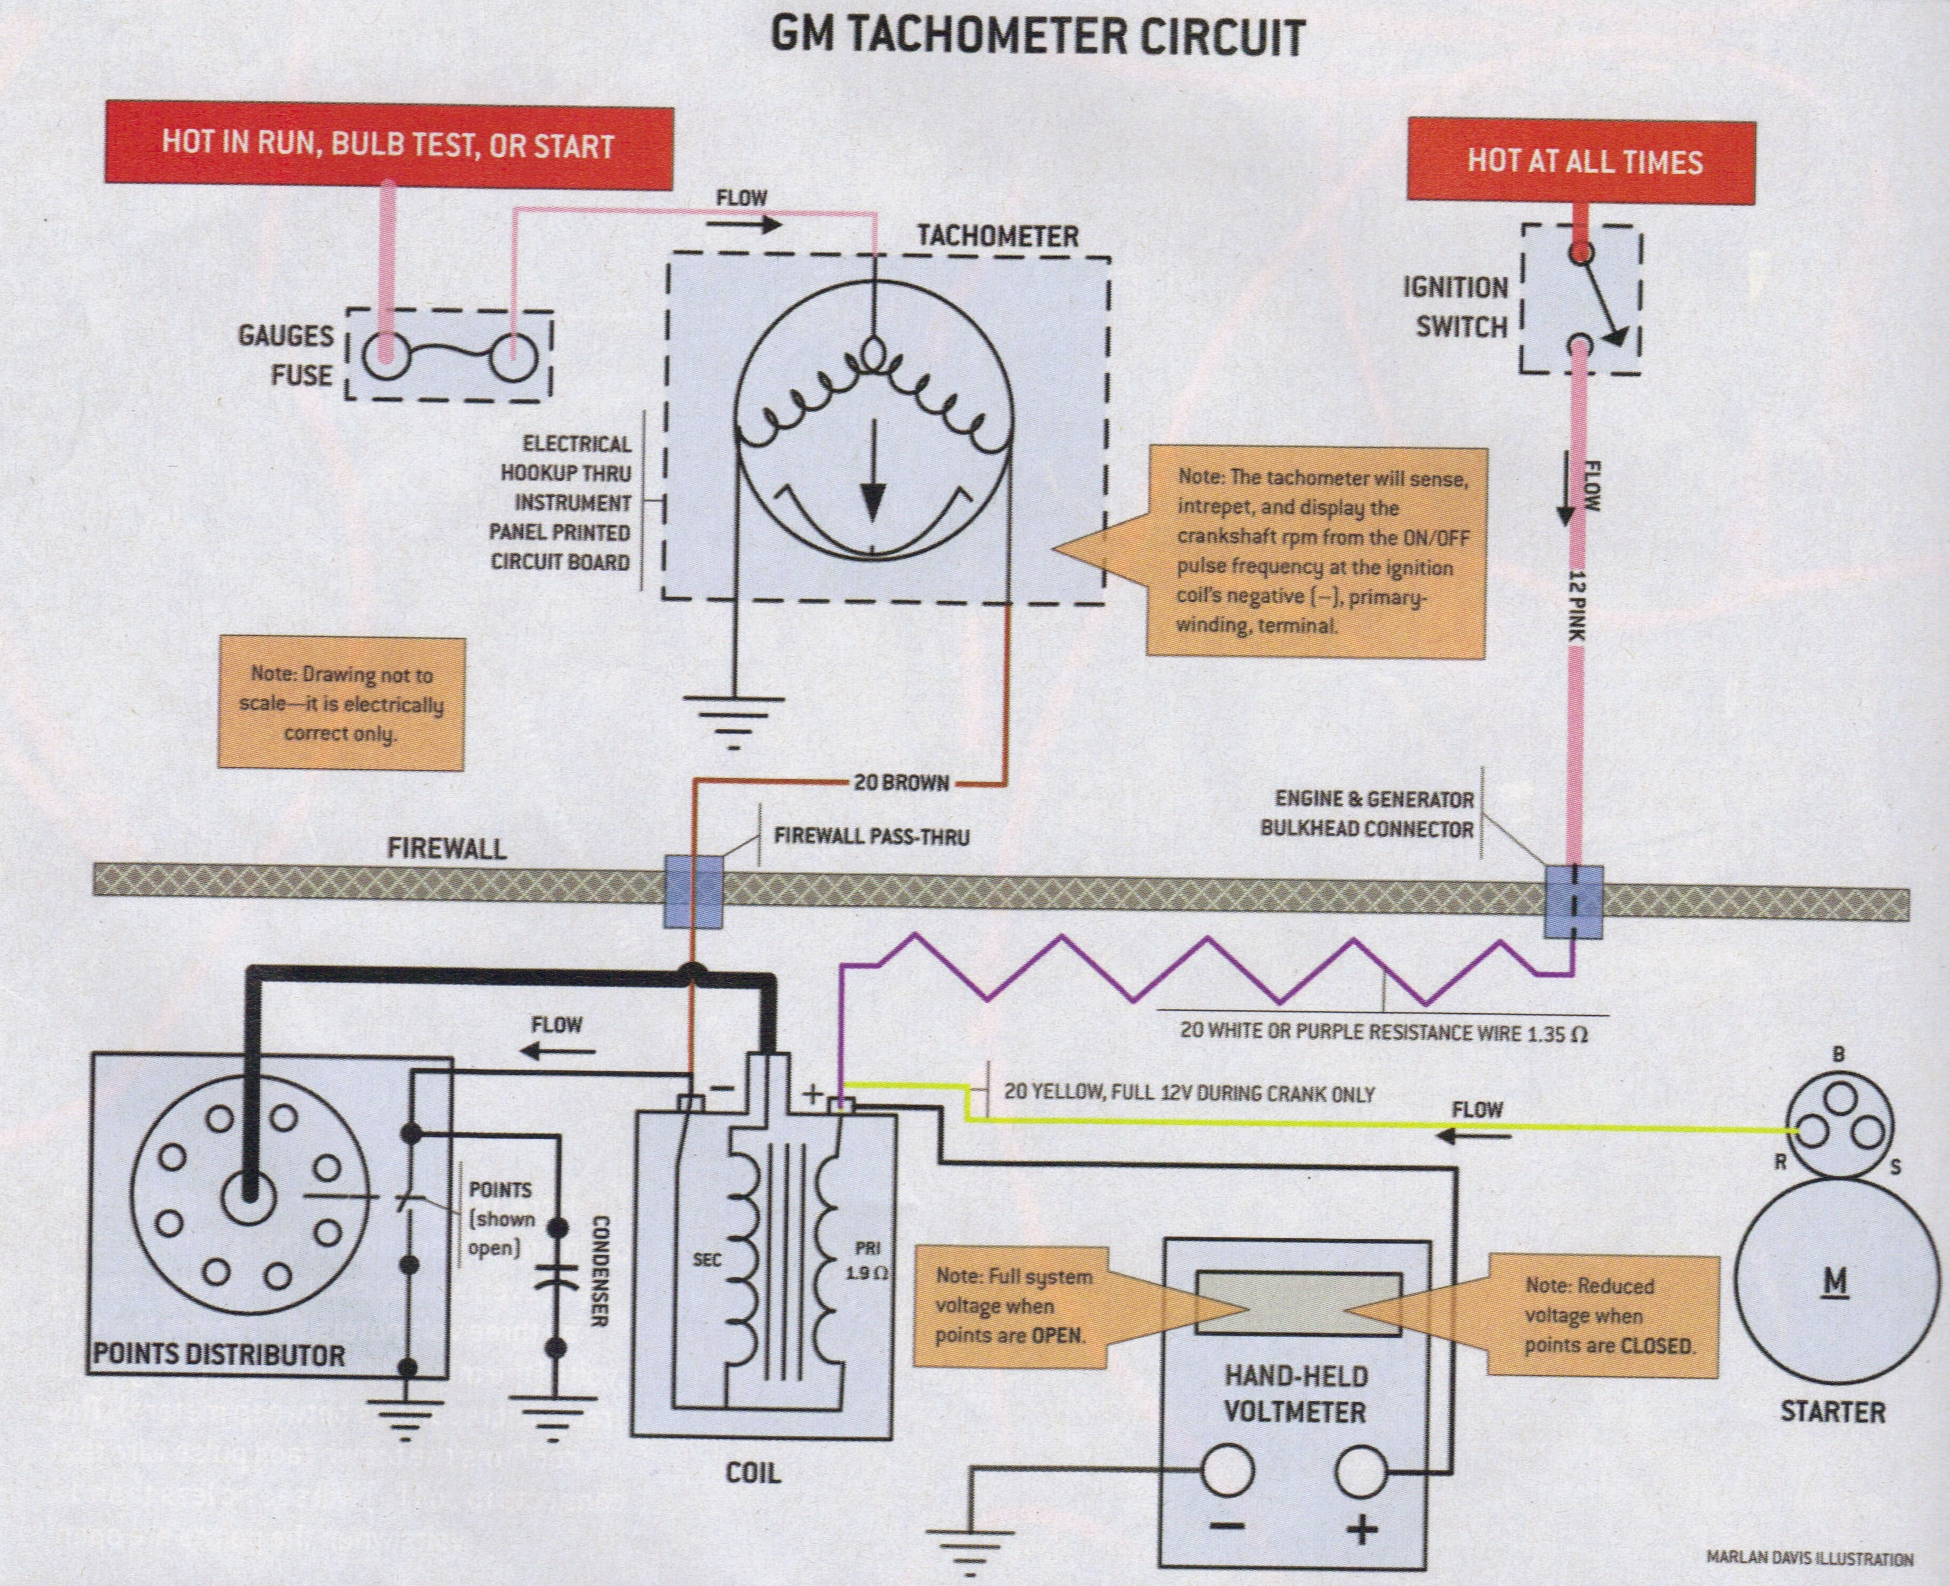 1989 Ford Ranger Tachometer Wiring Diagram Great Installation Of Engine Schematic Library Rh 75 Mac Happen De 1987 2000